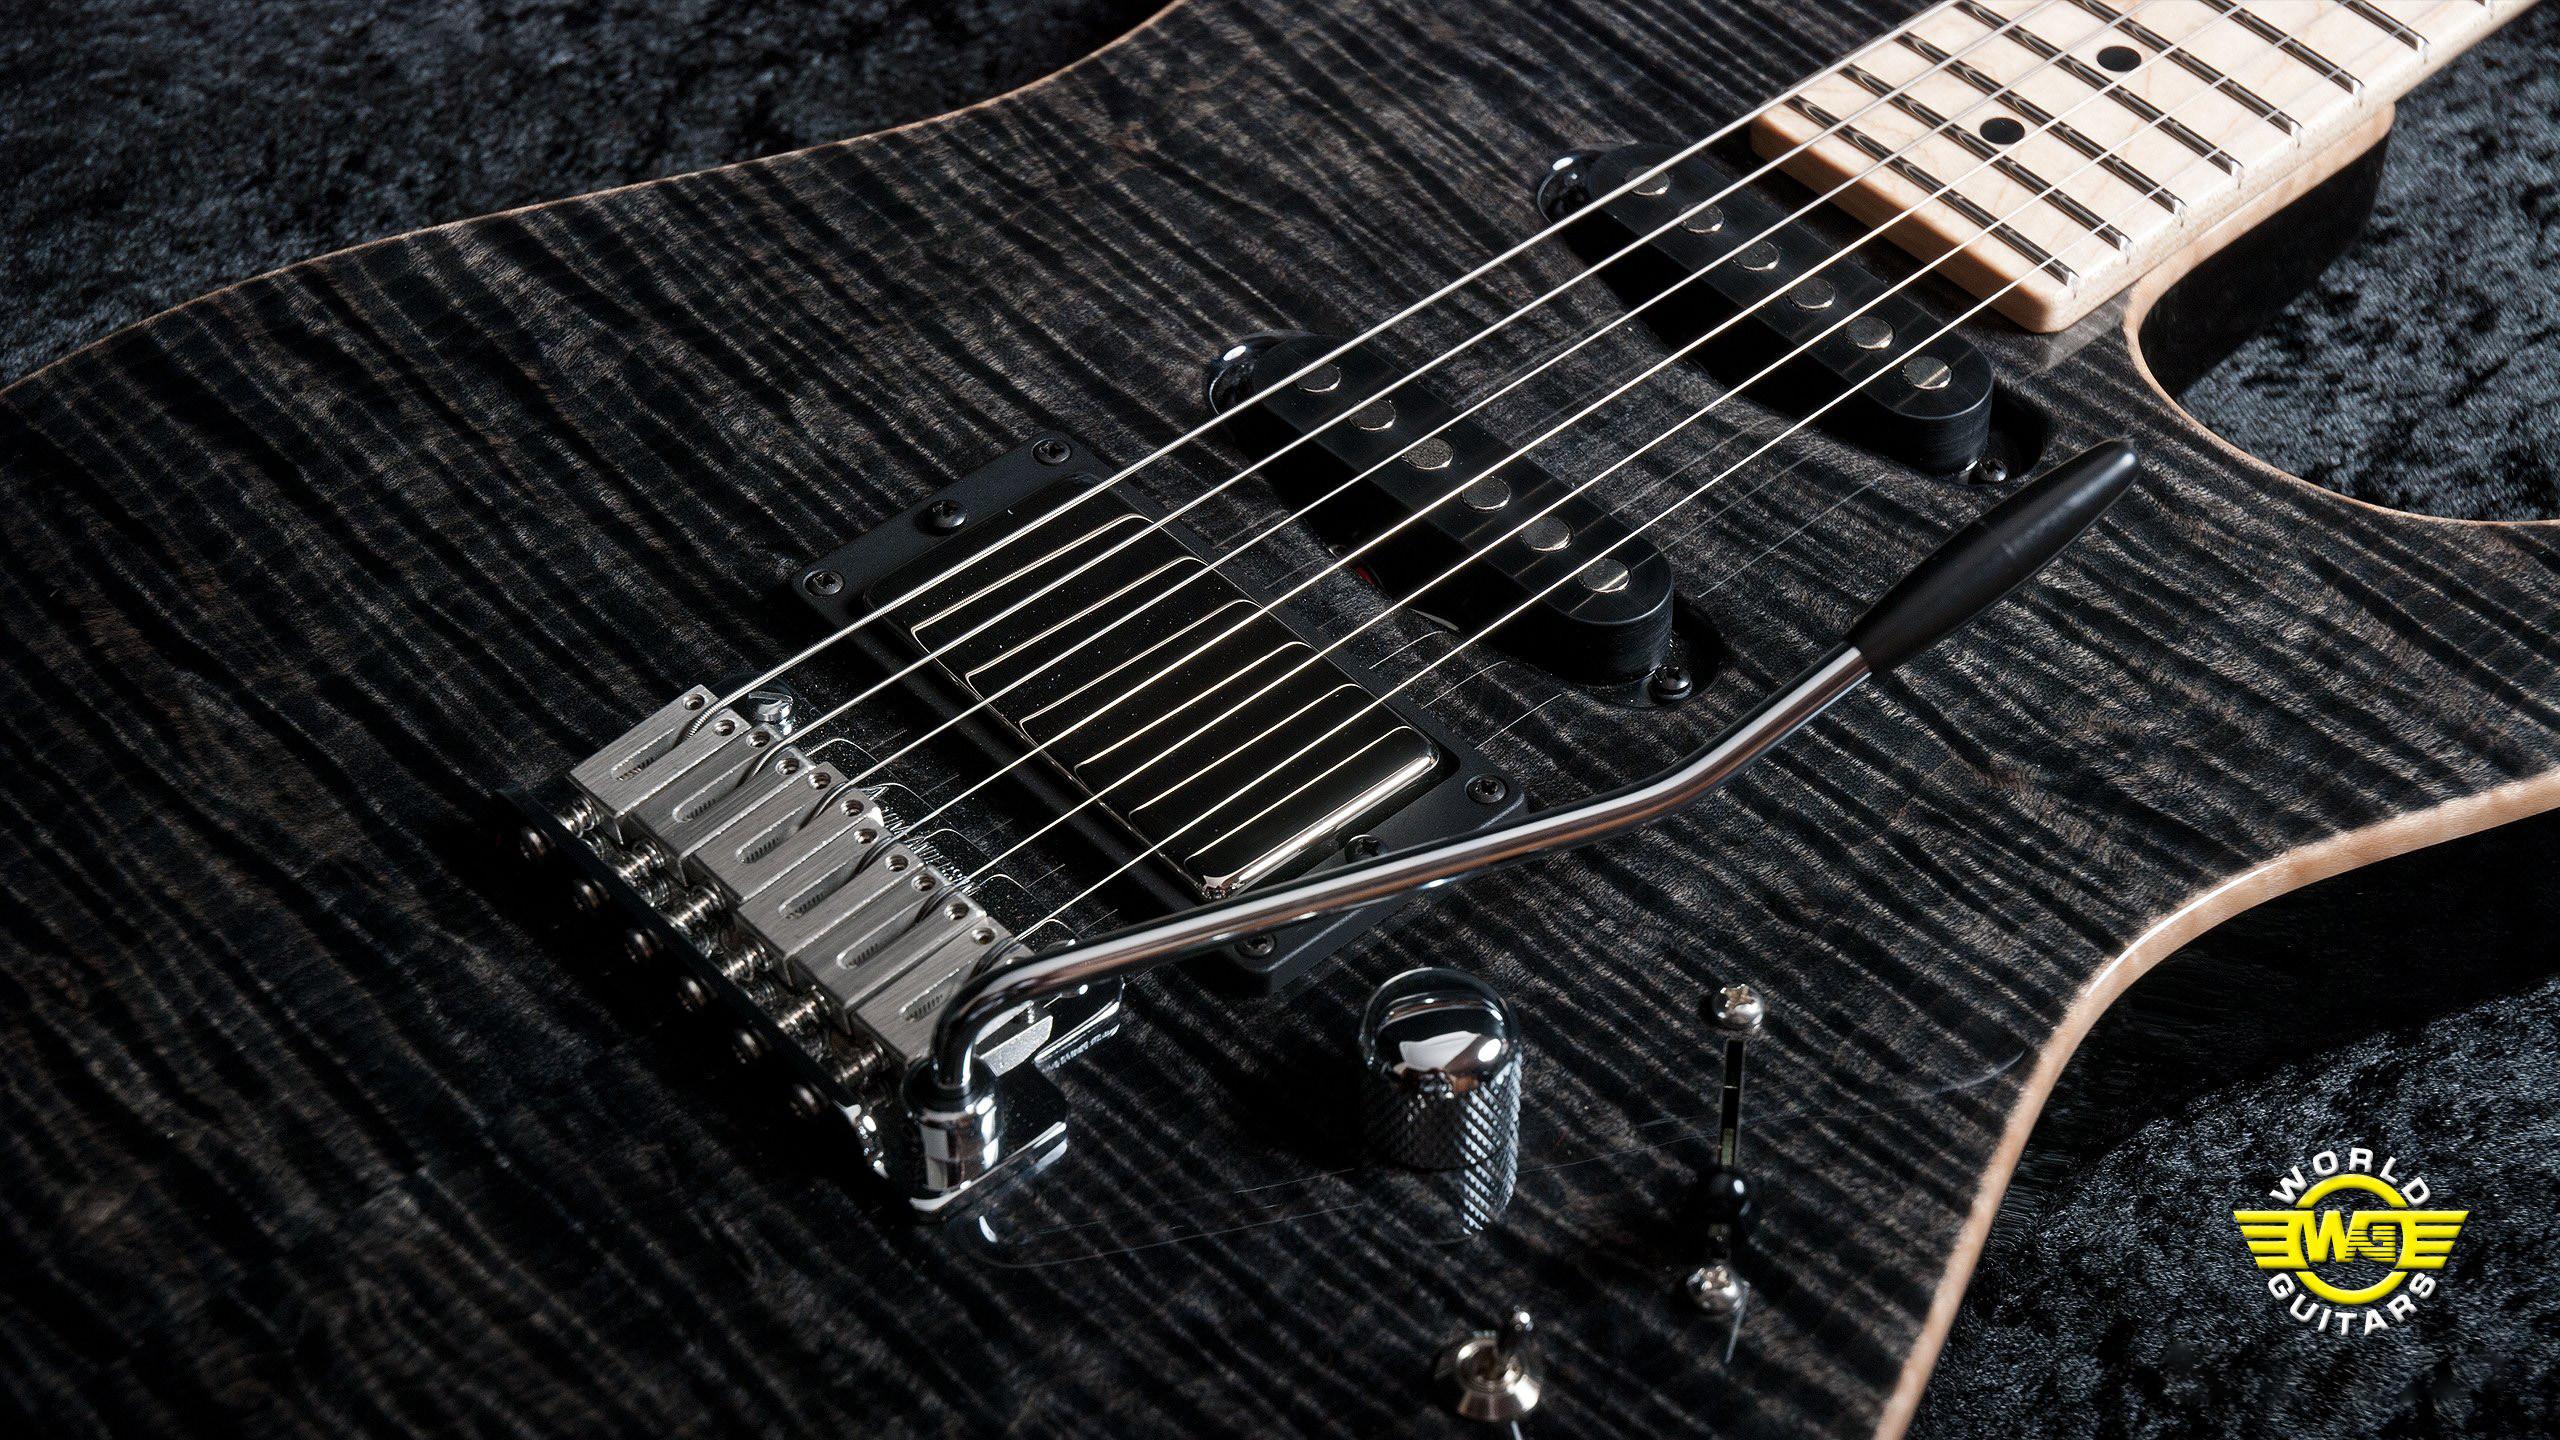 wallpaper.wiki-Fender-accessories-wallpaper-guitars-PIC-WPB002752